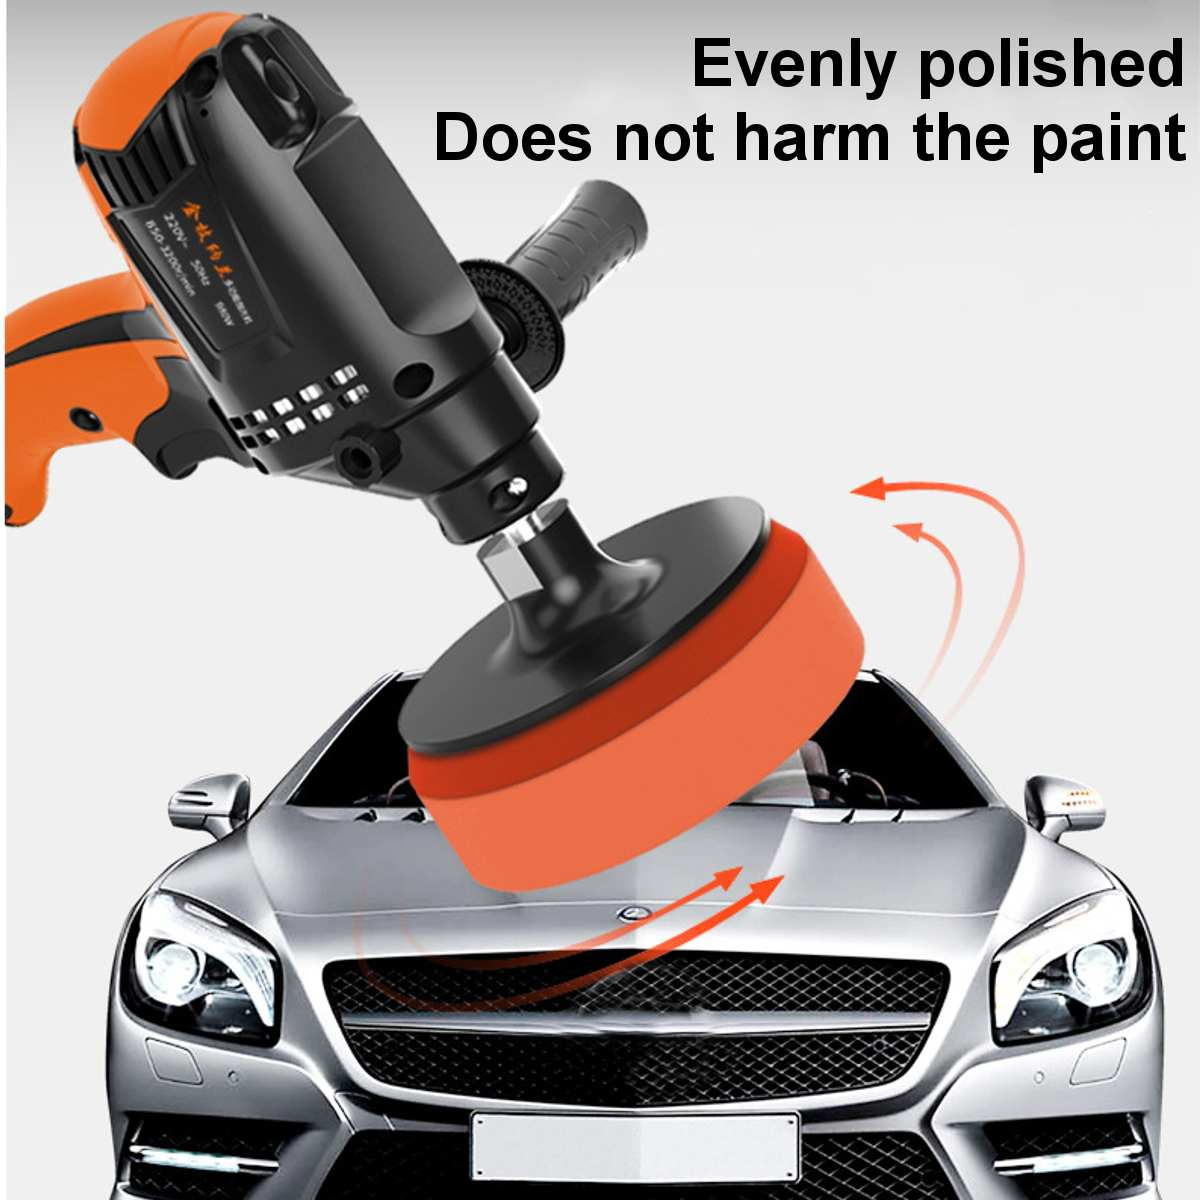 Tools : 980W Six Gears Car Polishing Machine Car Polisher Angle Grinder Other Tools Grinding Machine Electric Sander Adjustable Speed